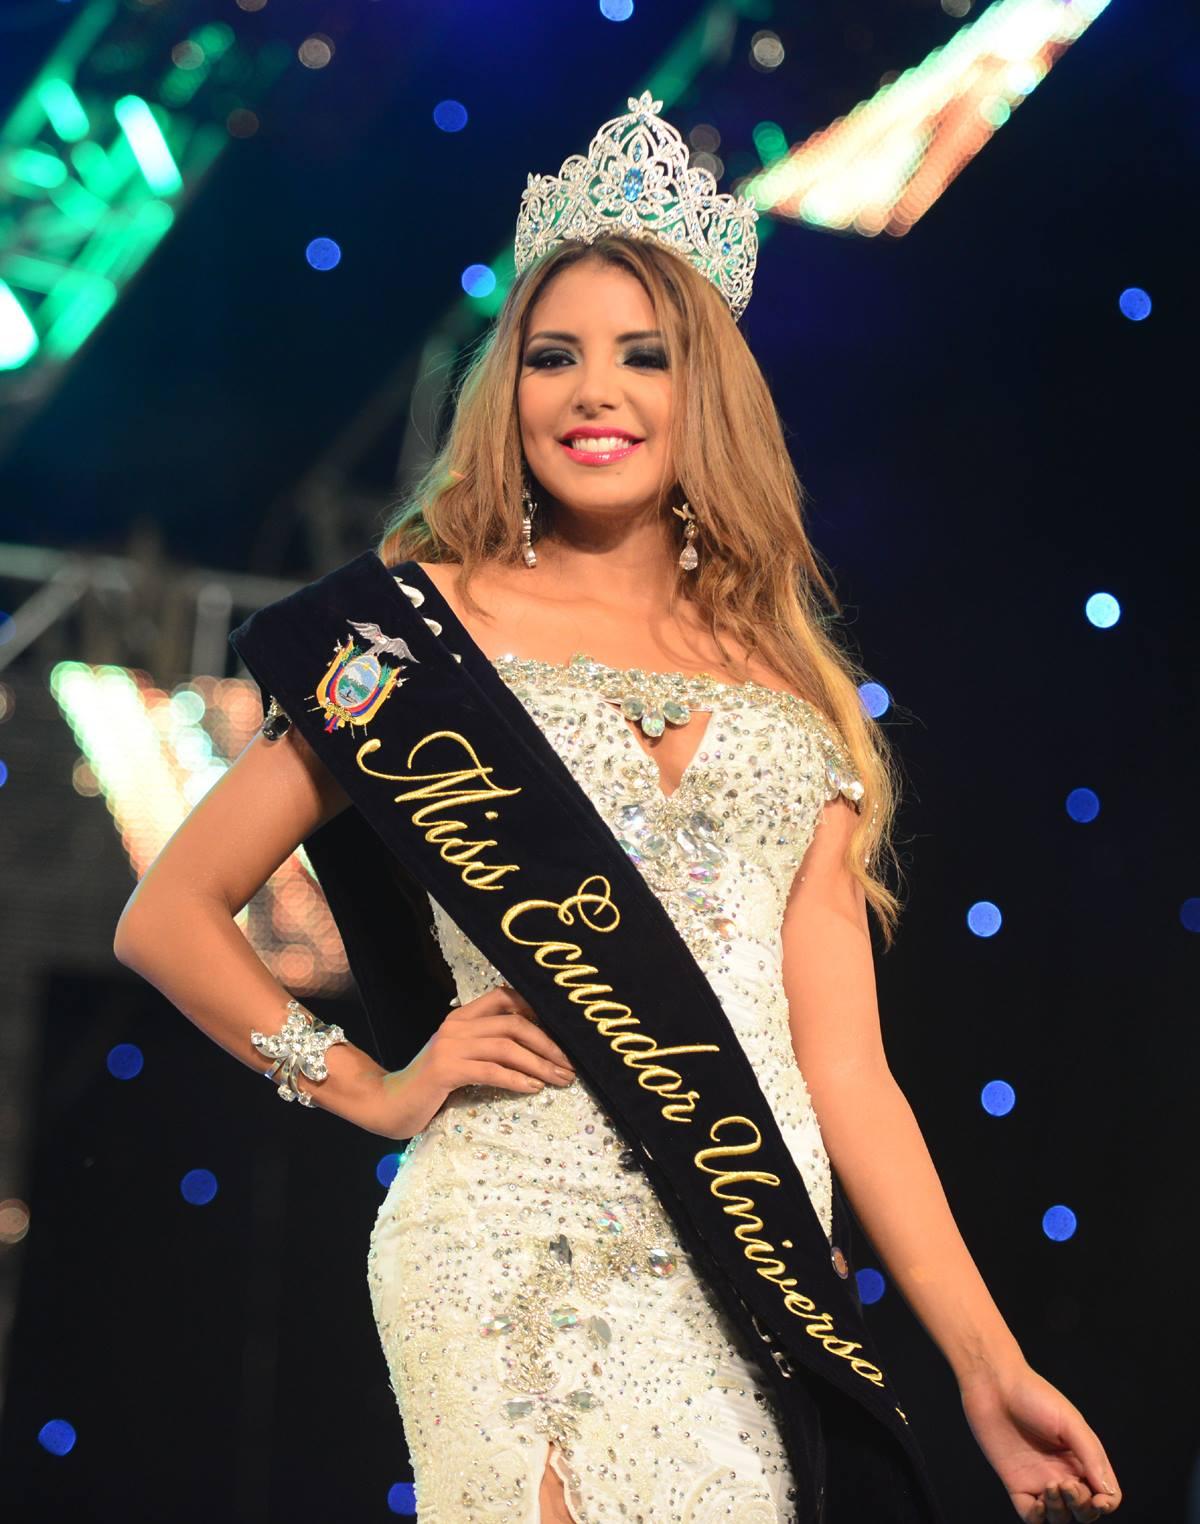 Image result for Miss Ecuador Connie Jimenez